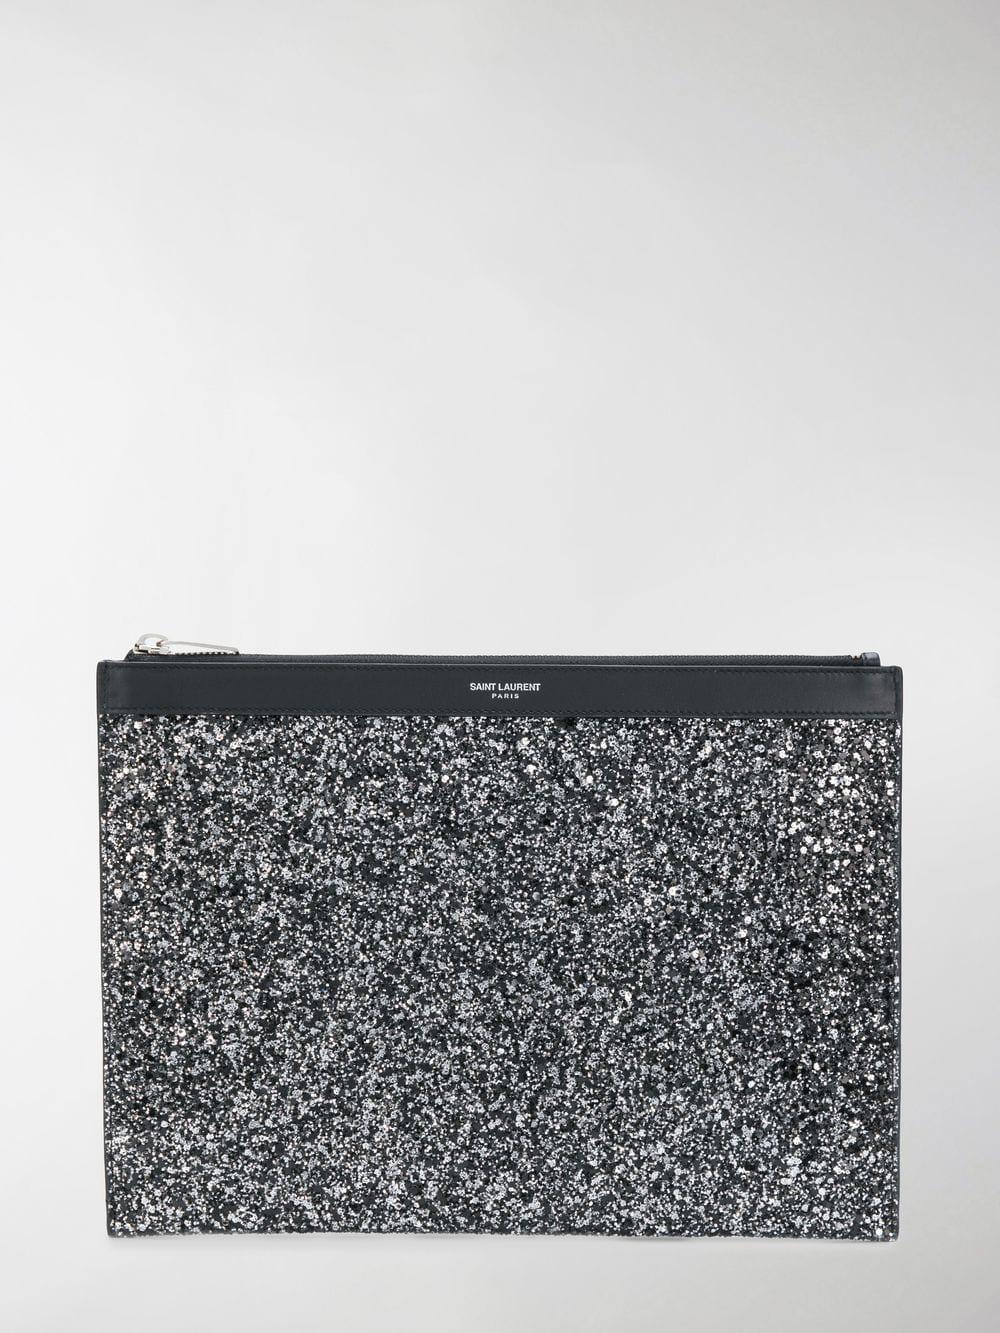 2447b12a340 Lyst - Saint Laurent Glitter Tablet Case in Black for Men